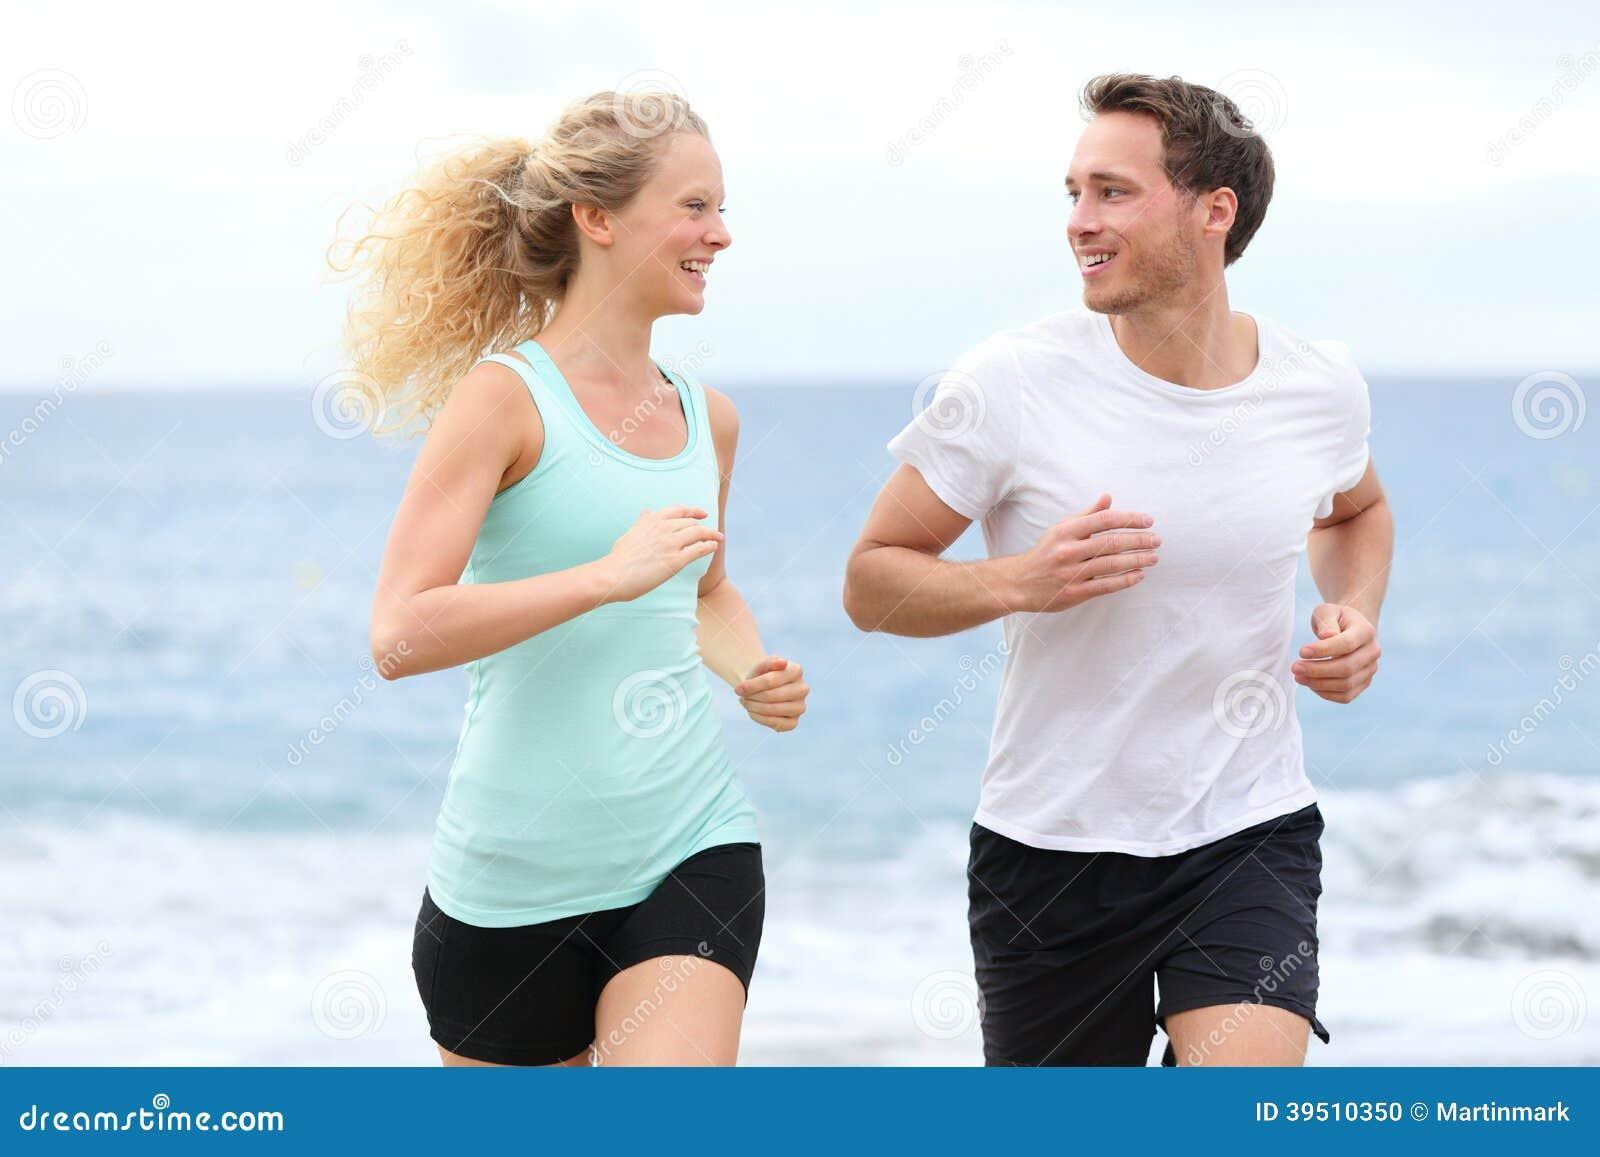 Running couple jogging exercising on beach talking